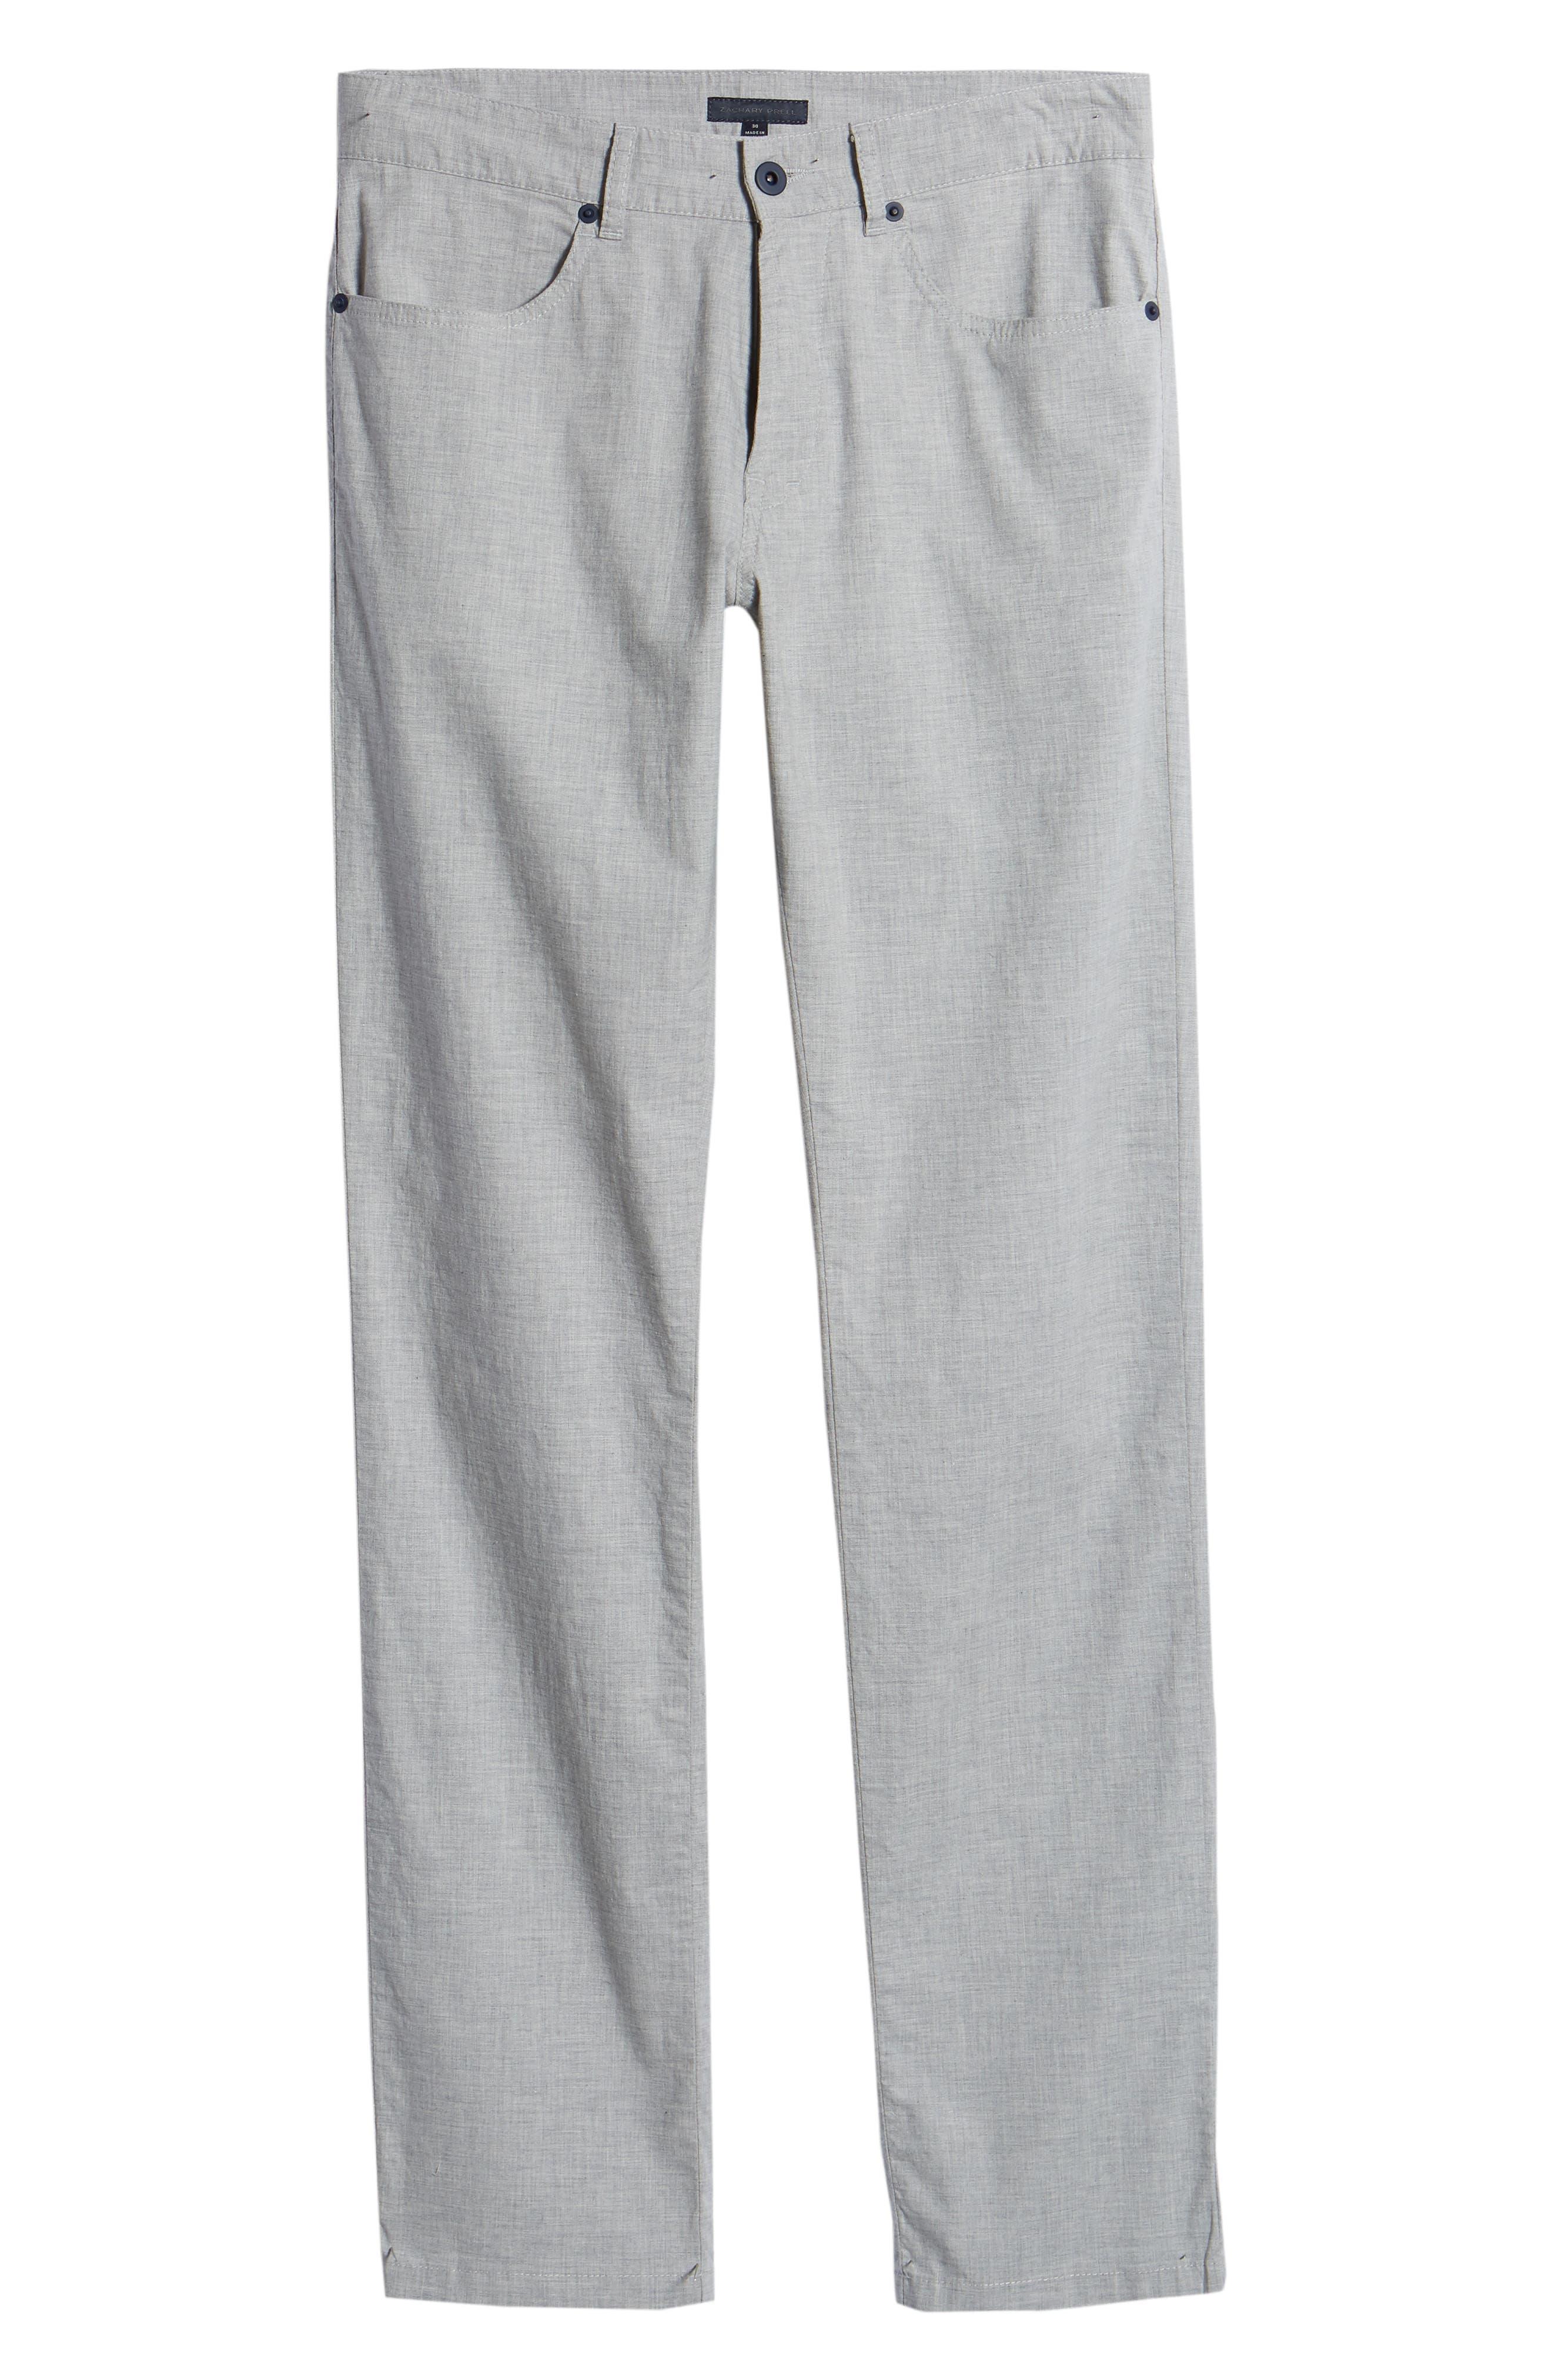 McKinney Regular Fit Straight Leg Pants,                             Alternate thumbnail 6, color,                             GREY